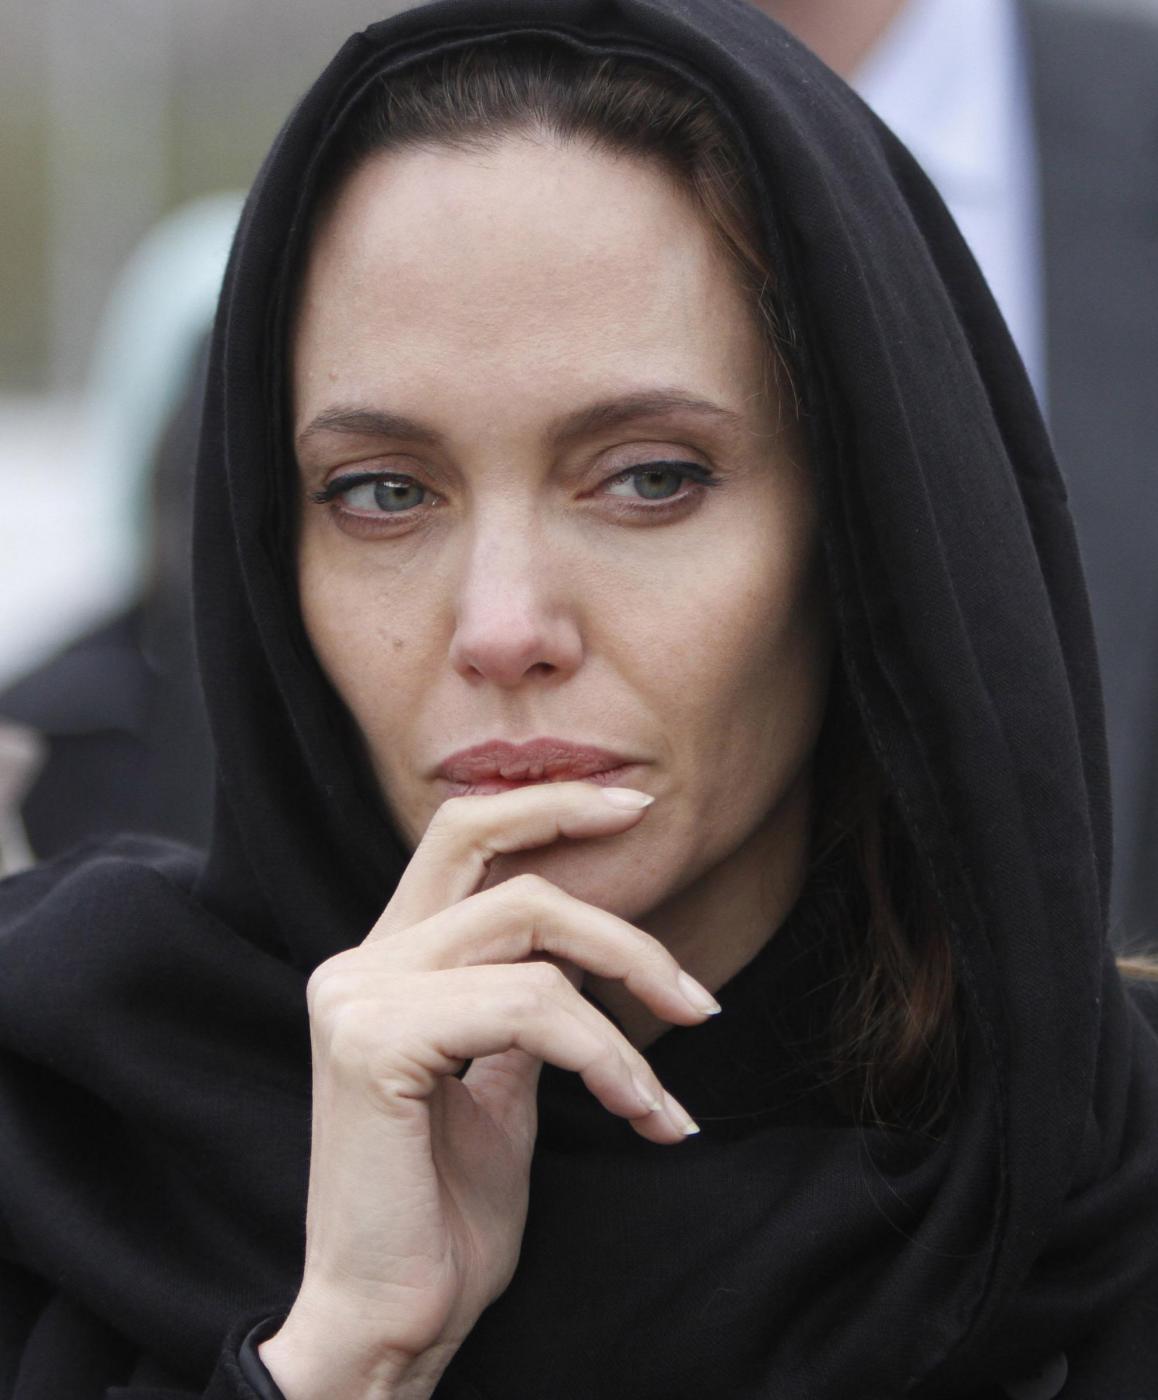 Angelina Jolie in Bosnia contro stupri in guerra03